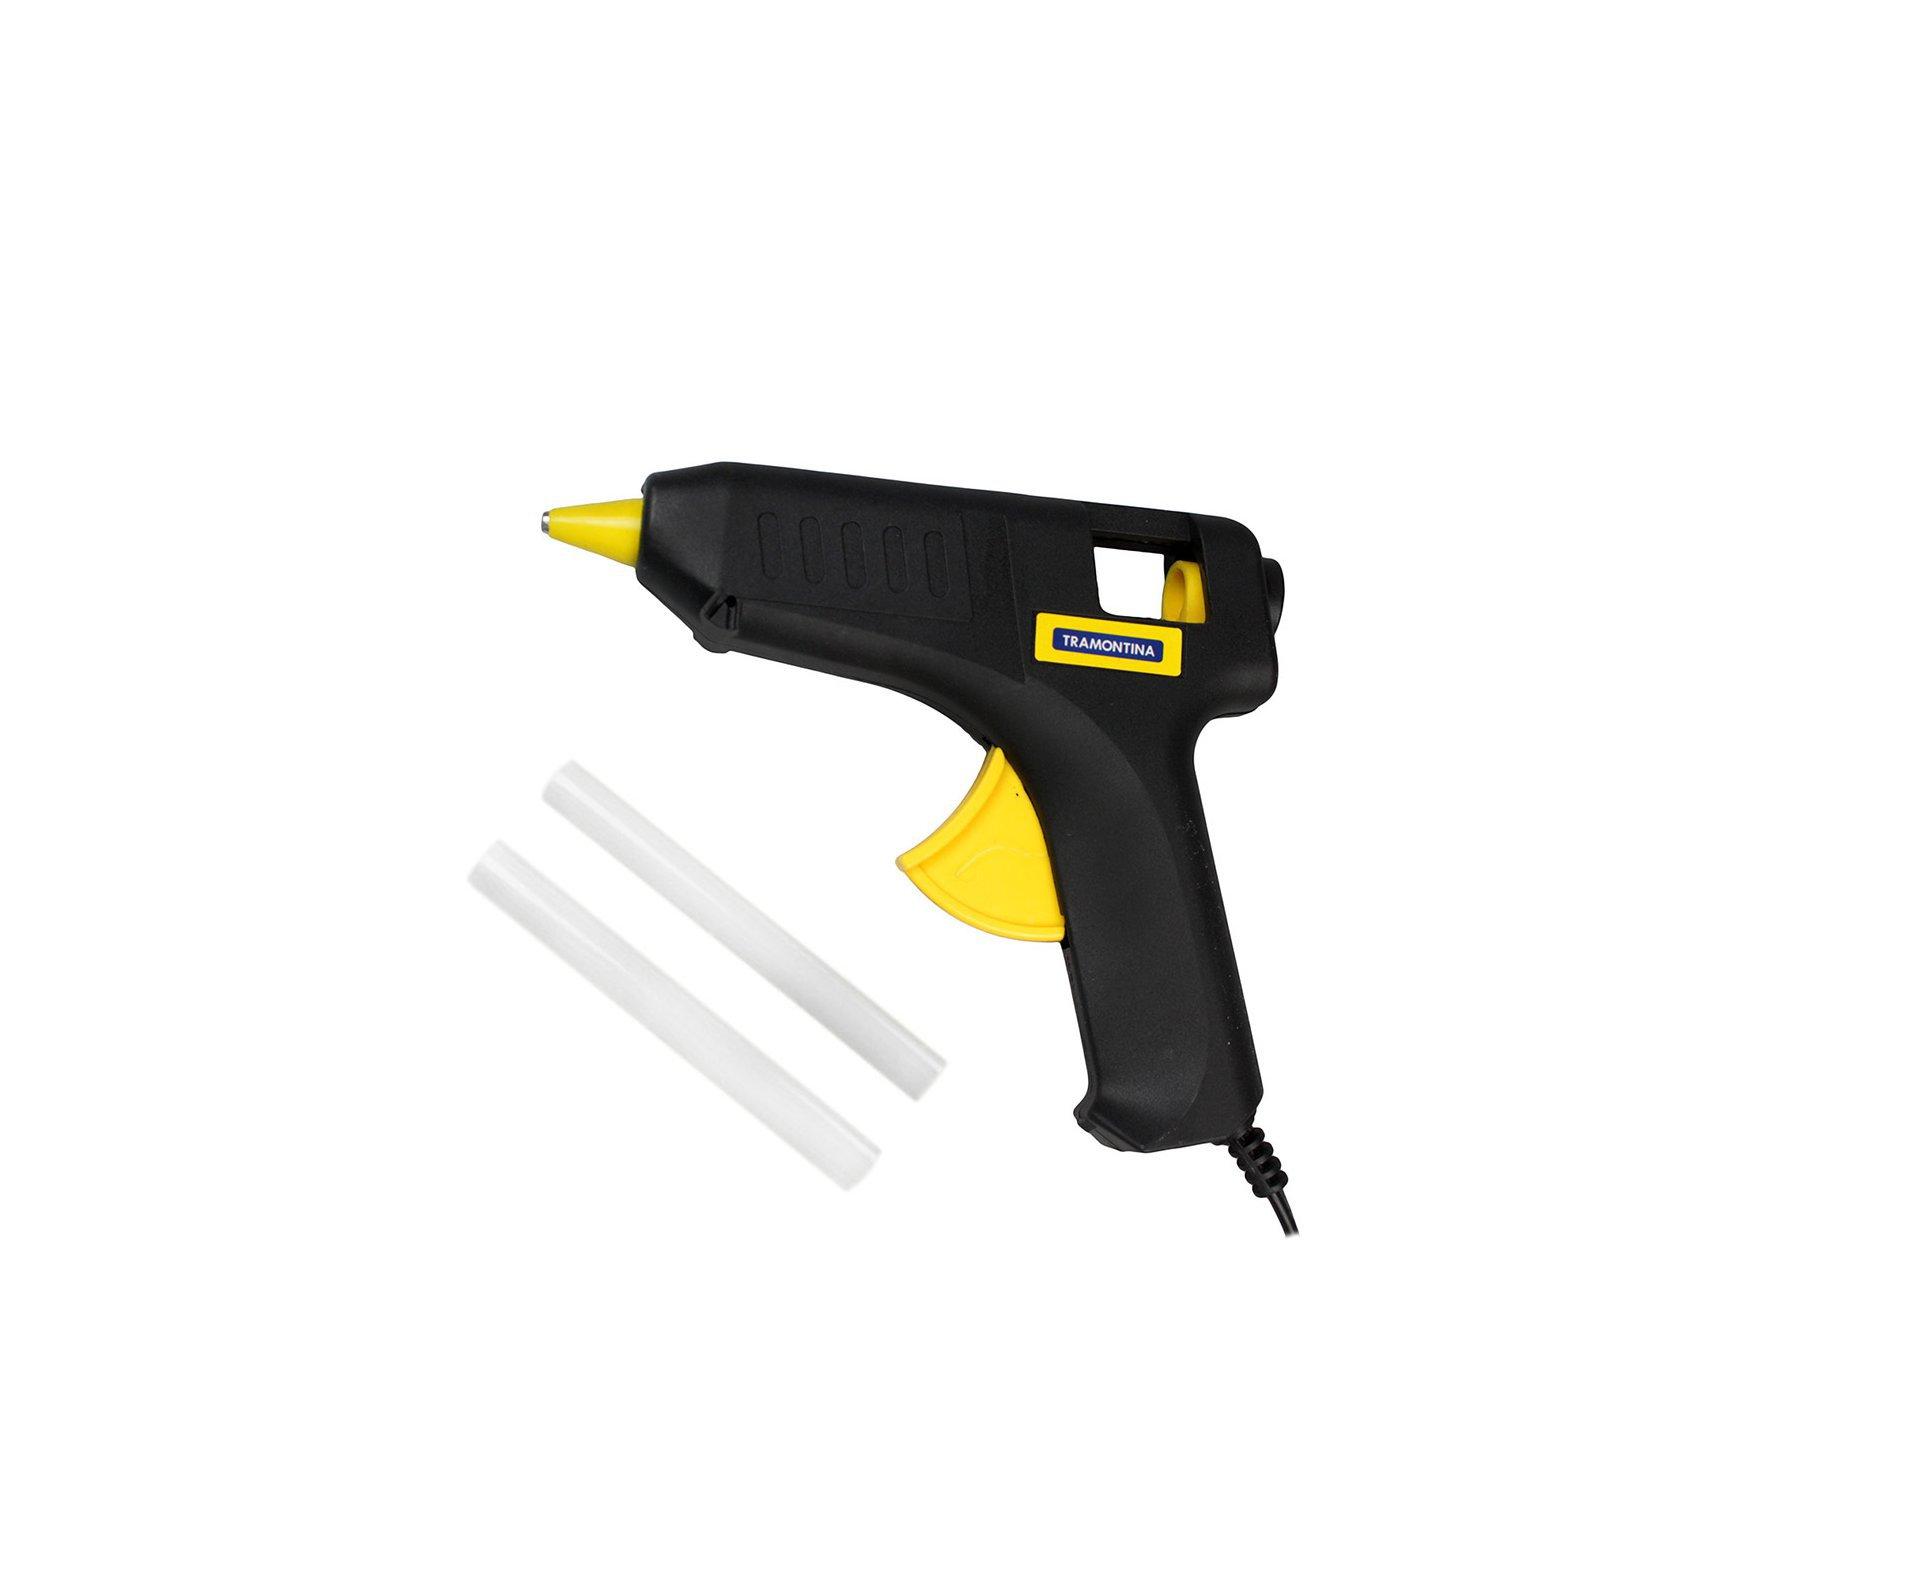 Pistola De Cola Quente Elétrica 40-50 W Bivolt - Tramontina